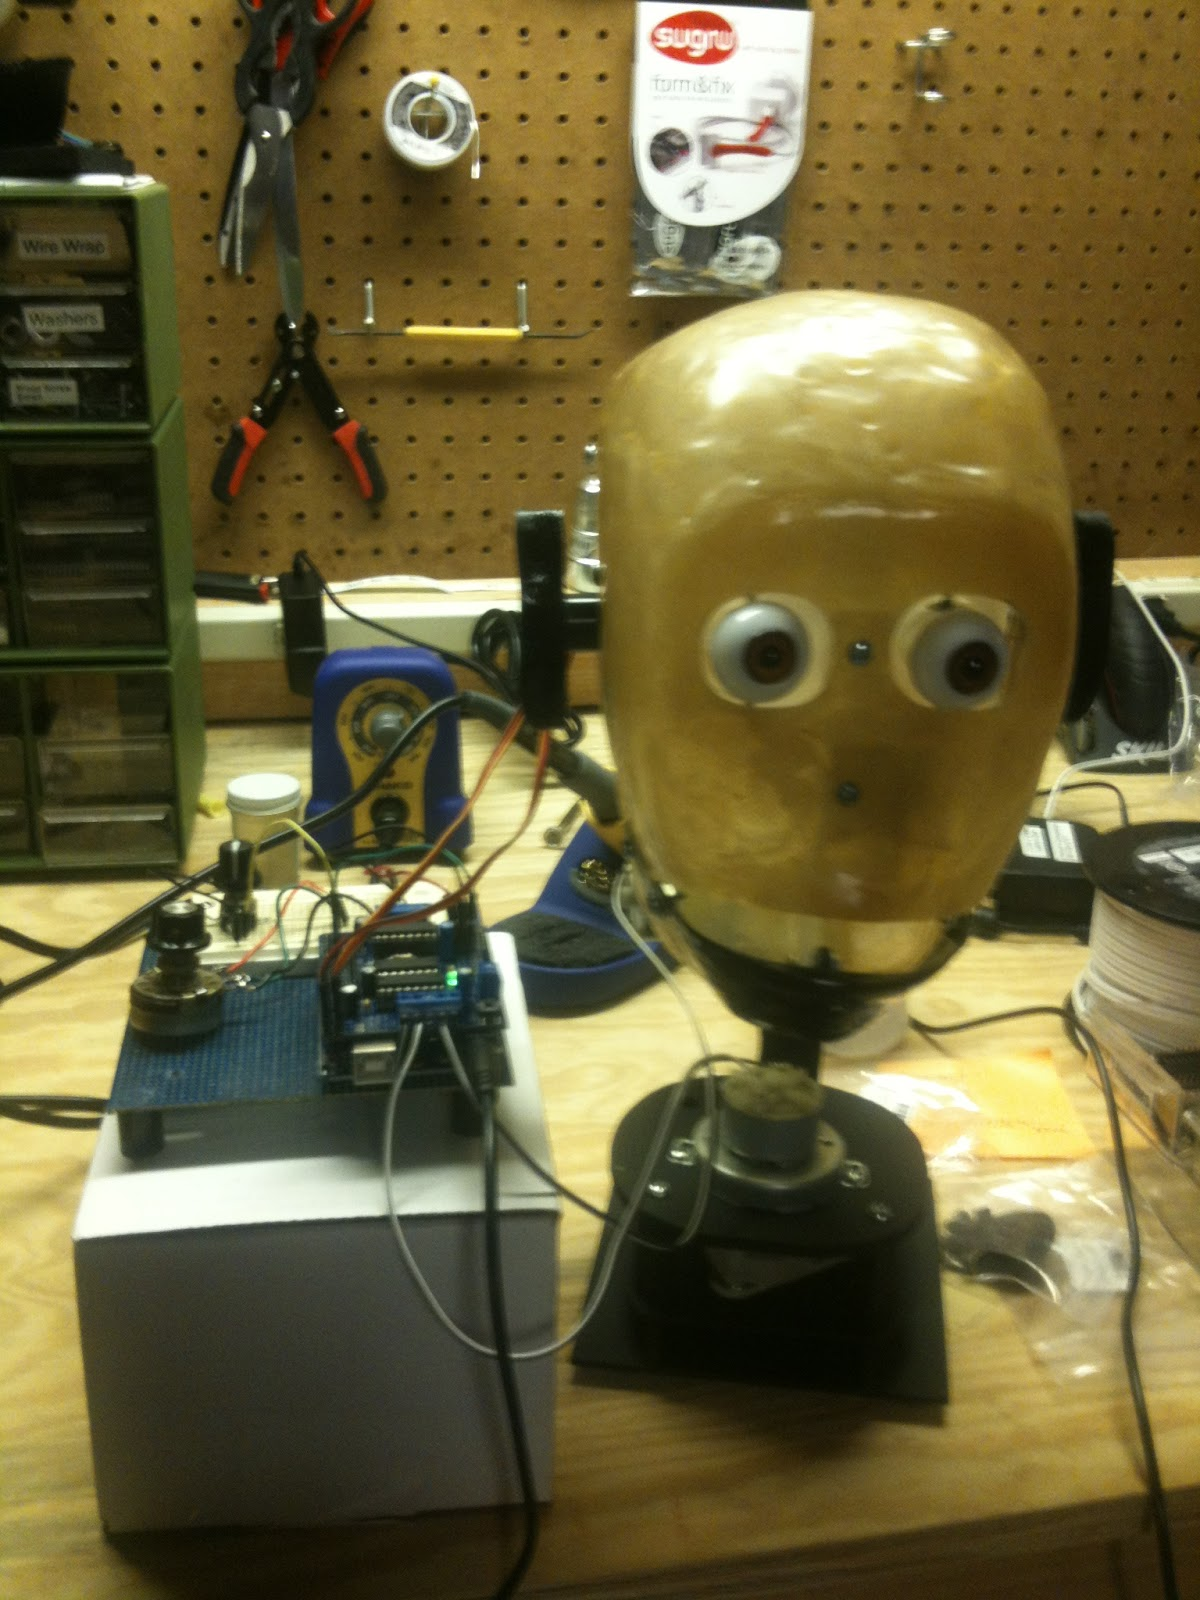 The 21st Century Digital Home: Wiring up Bob the Robotic Head